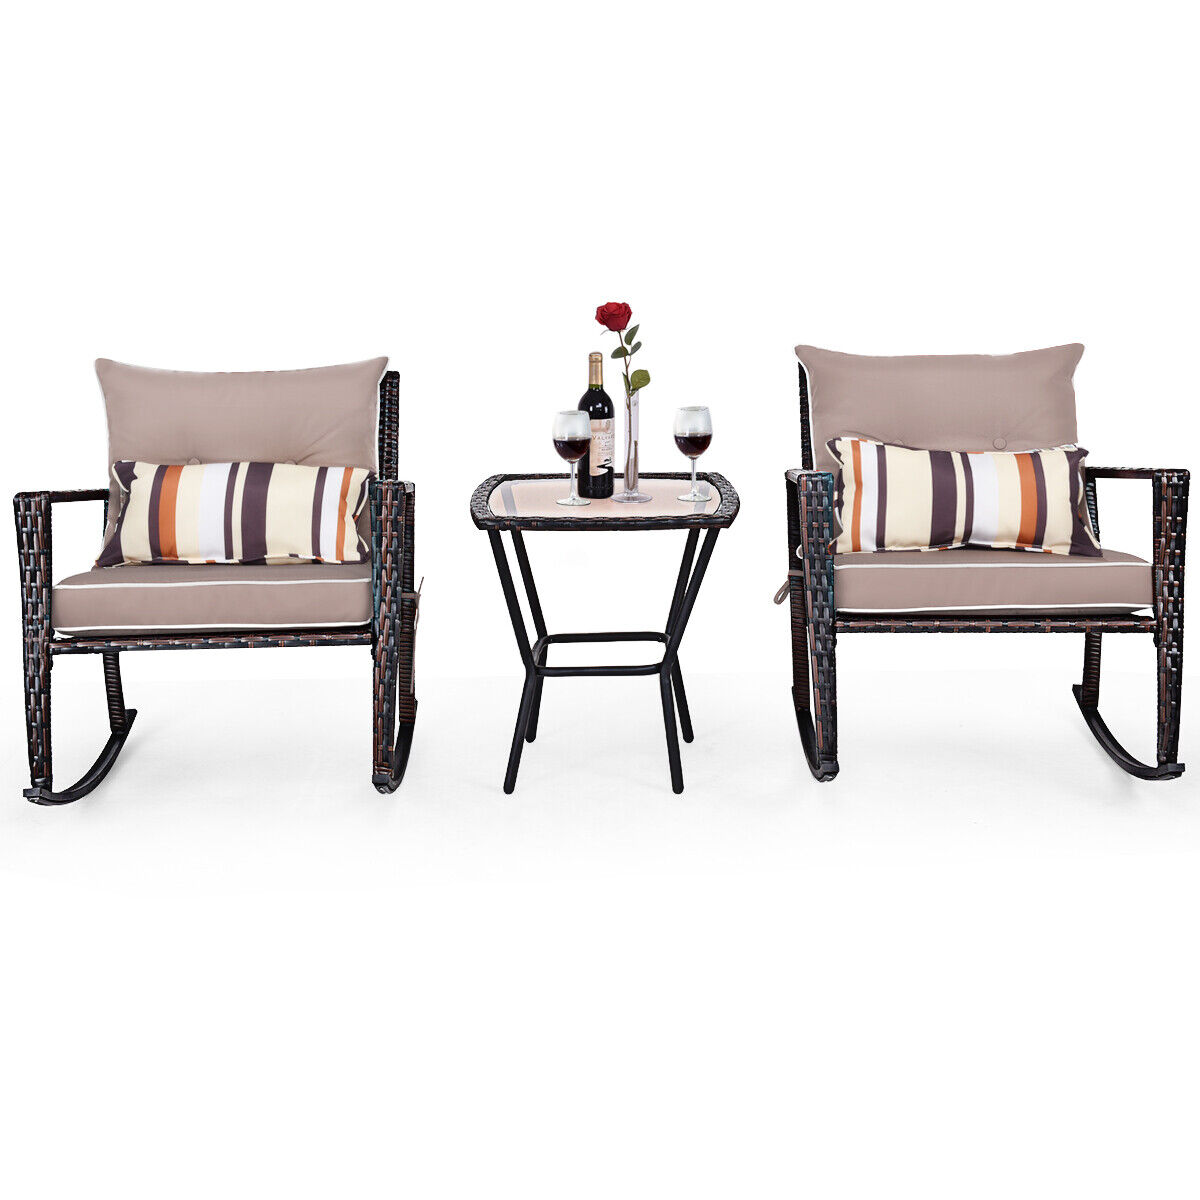 Garden Furniture - 3 PCS Rattan Garden Furniture Bistro Set Rocking Chairs Coffee Table Cushions